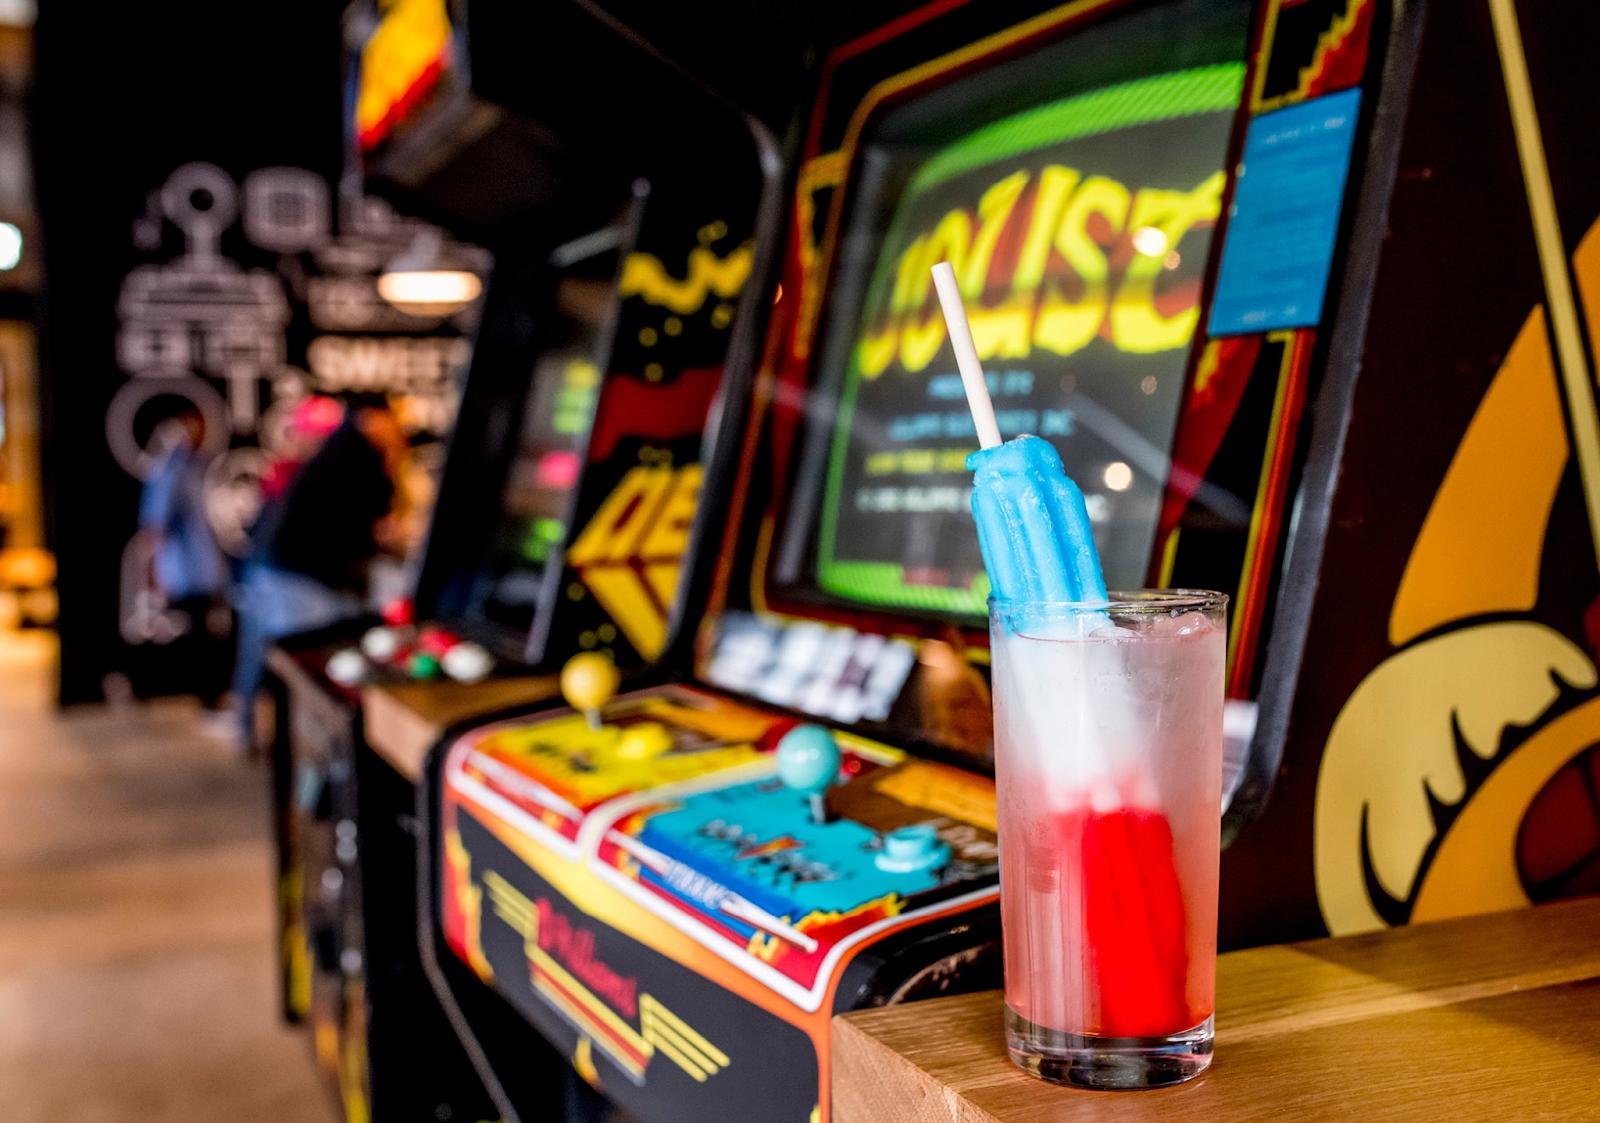 16 Bit Bar arcade games